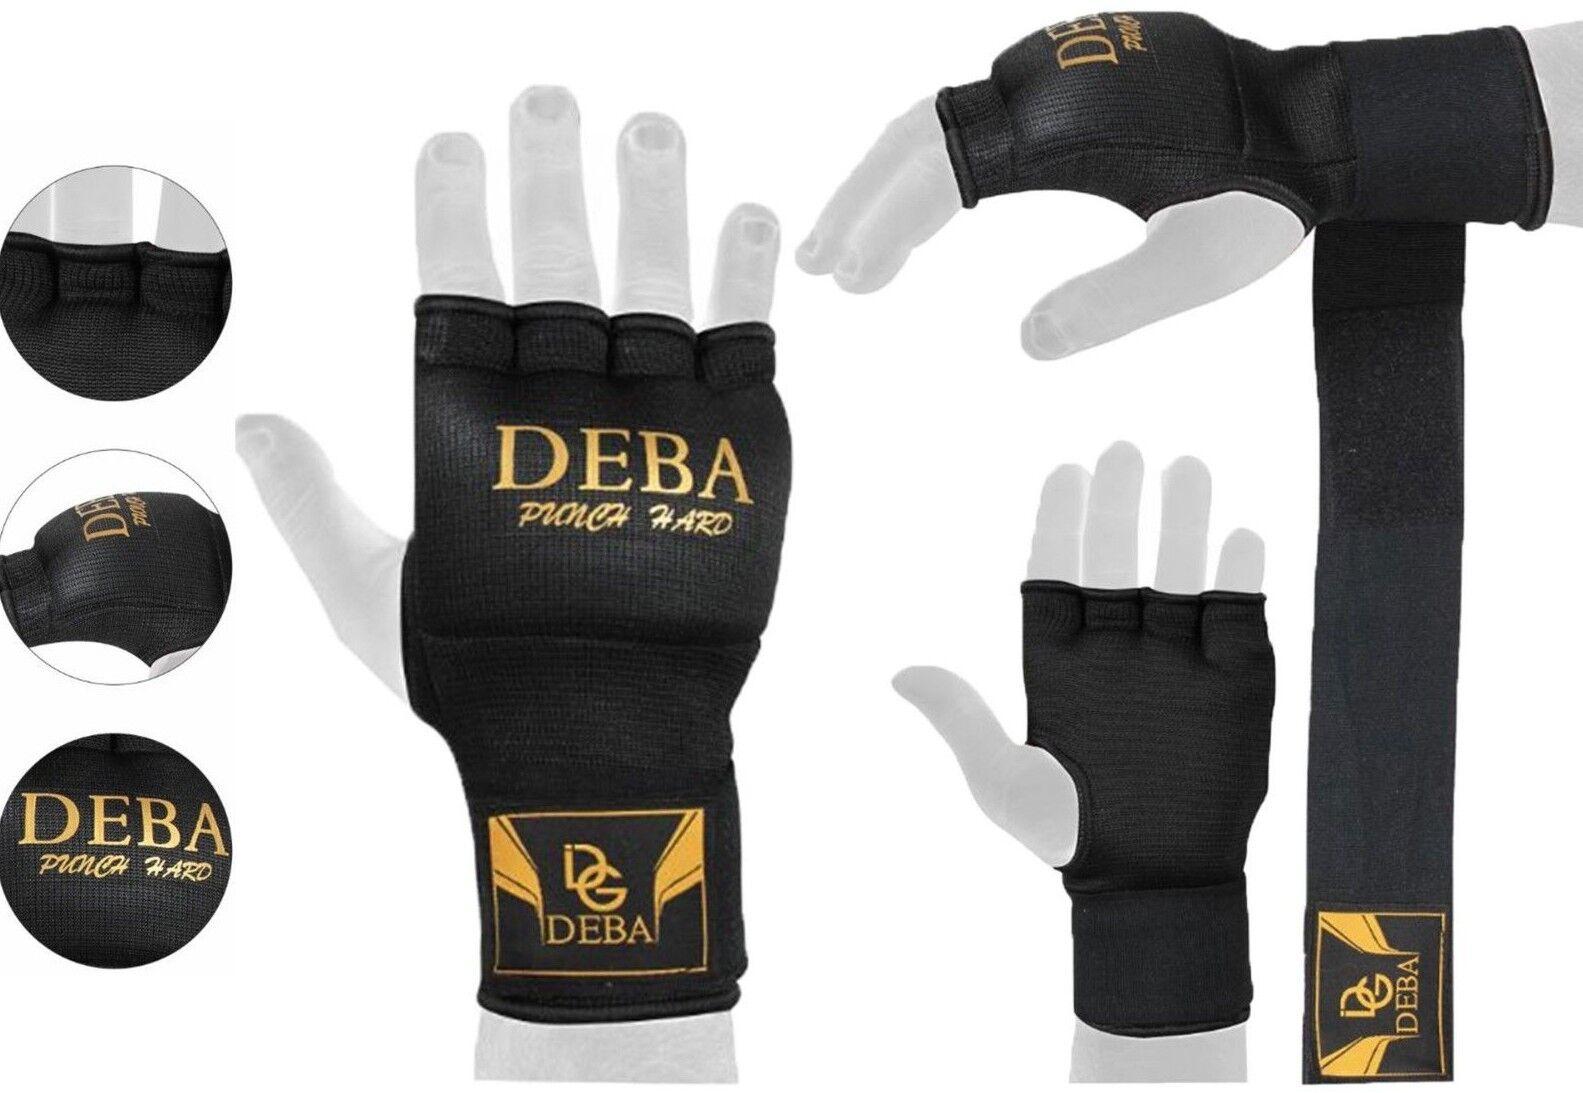 Deba® Boxbandage Gel Handschuh MMA Handschuhe Gel wrap Kampsport Kickboxen Neu